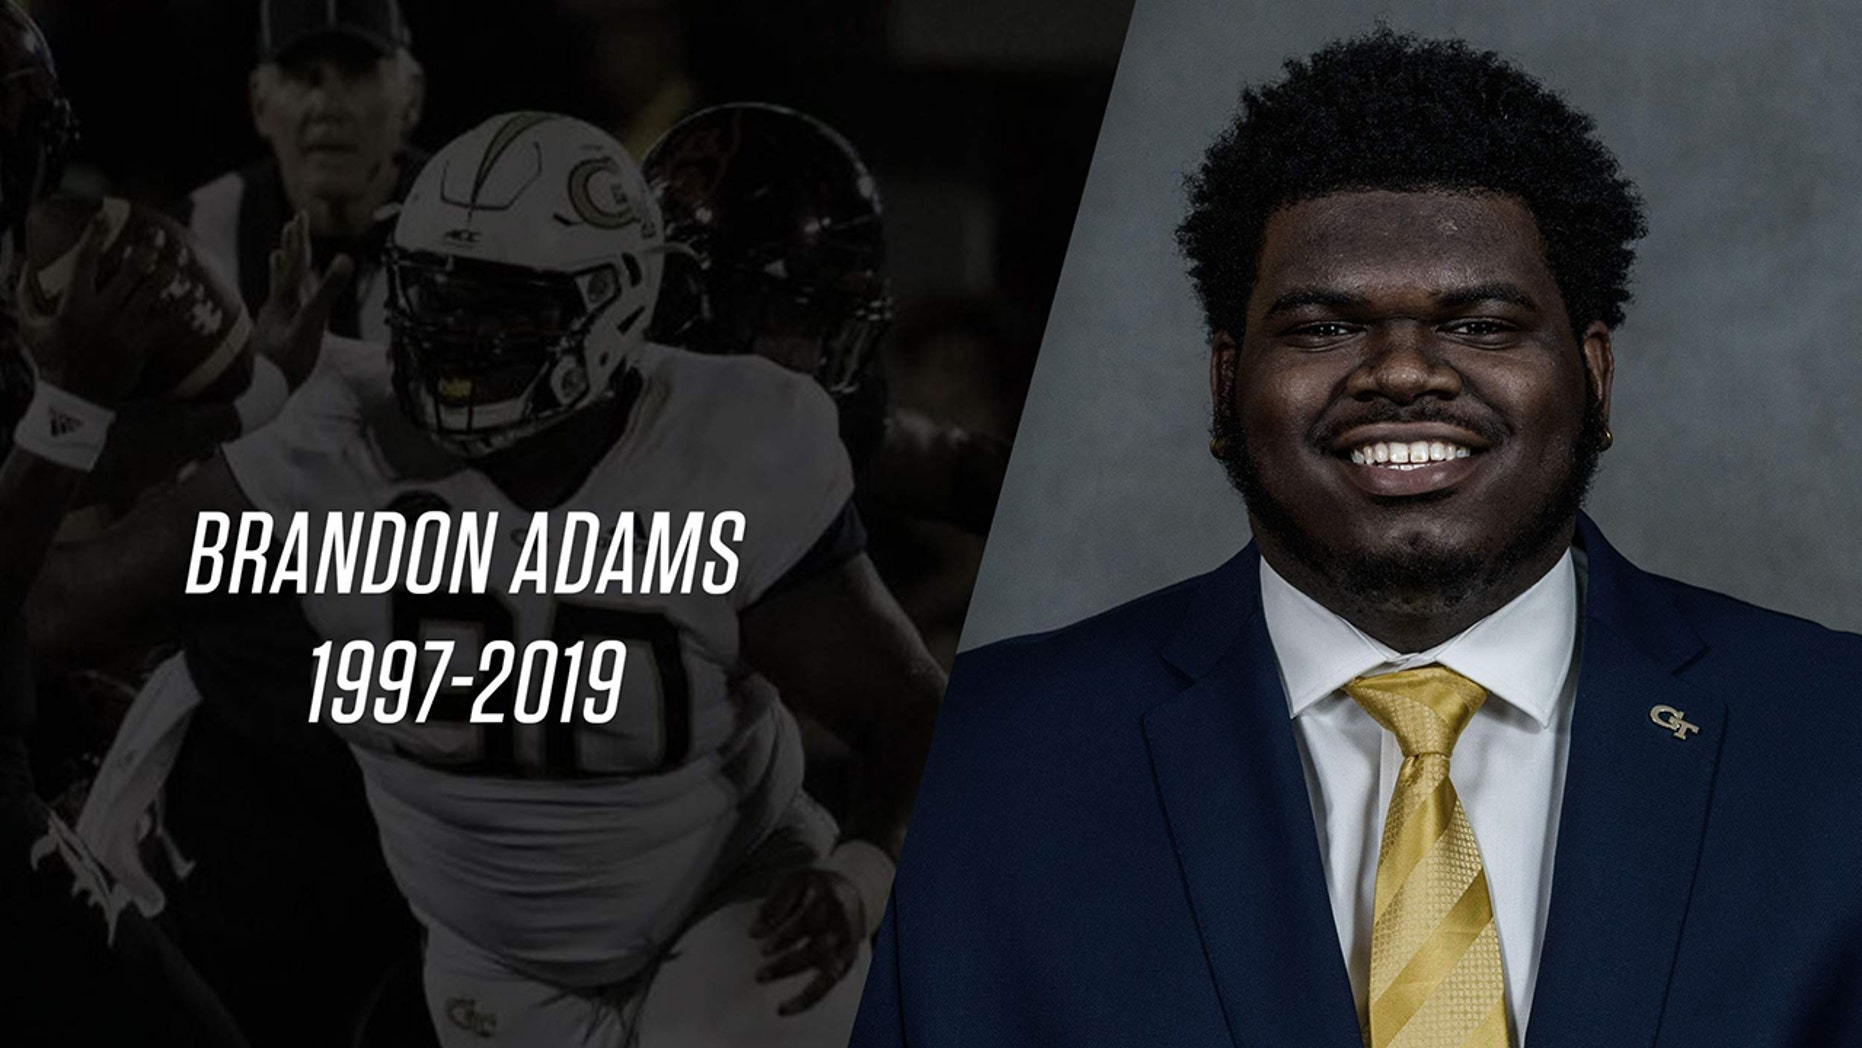 Georgia Tech defensive tackle Brandon Adams died Saturday at age 21, according to school officials.